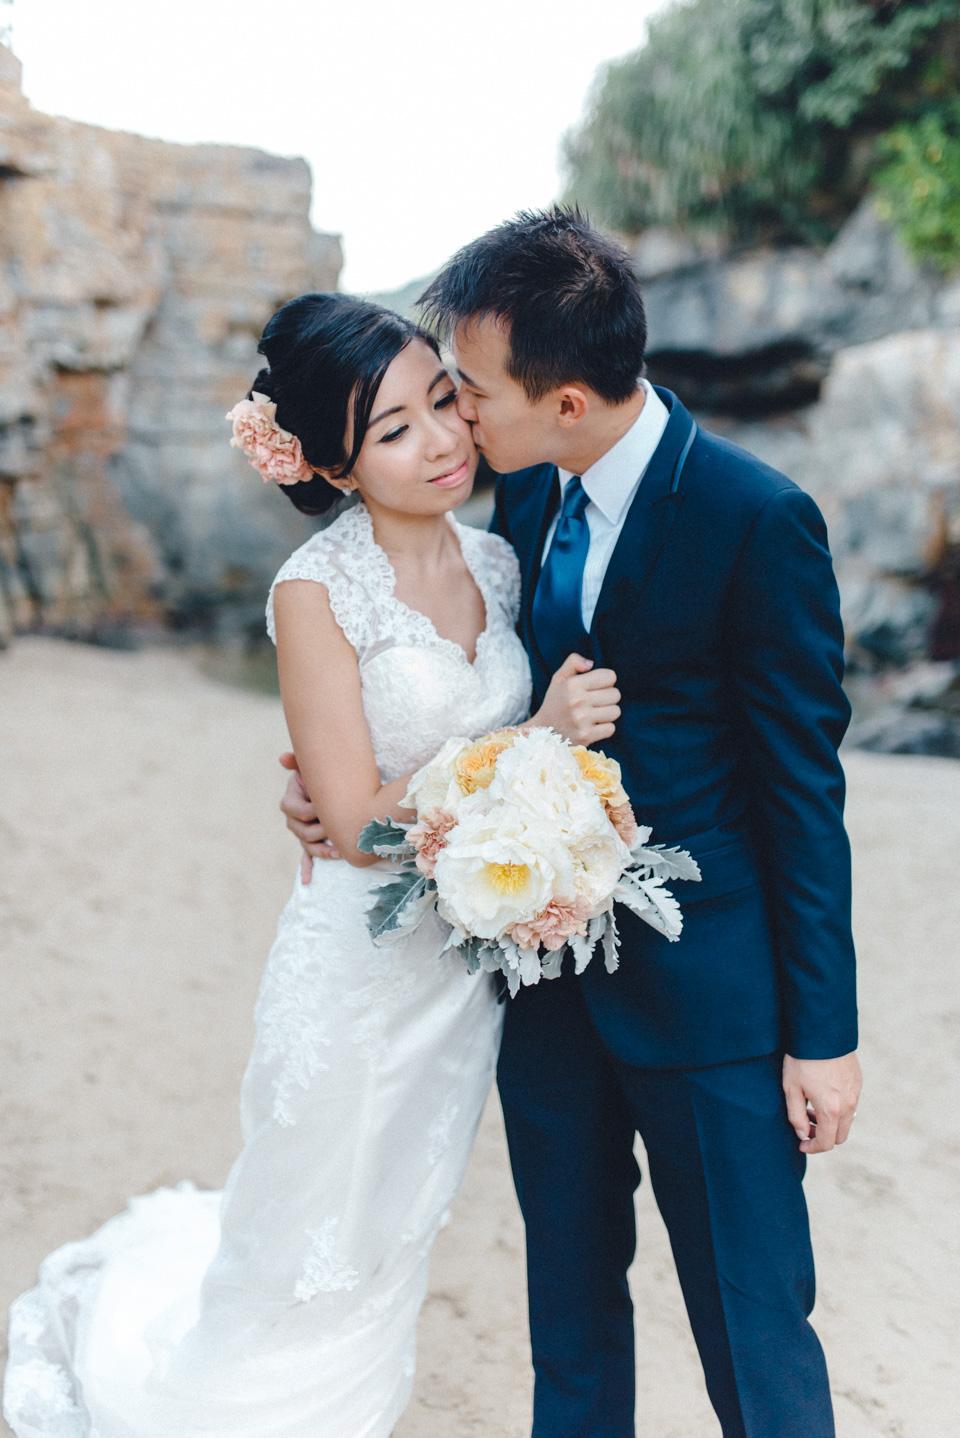 shooting-hongkong-beach-25 After Weddingshoot in HongKongshooting hongkong beach 25